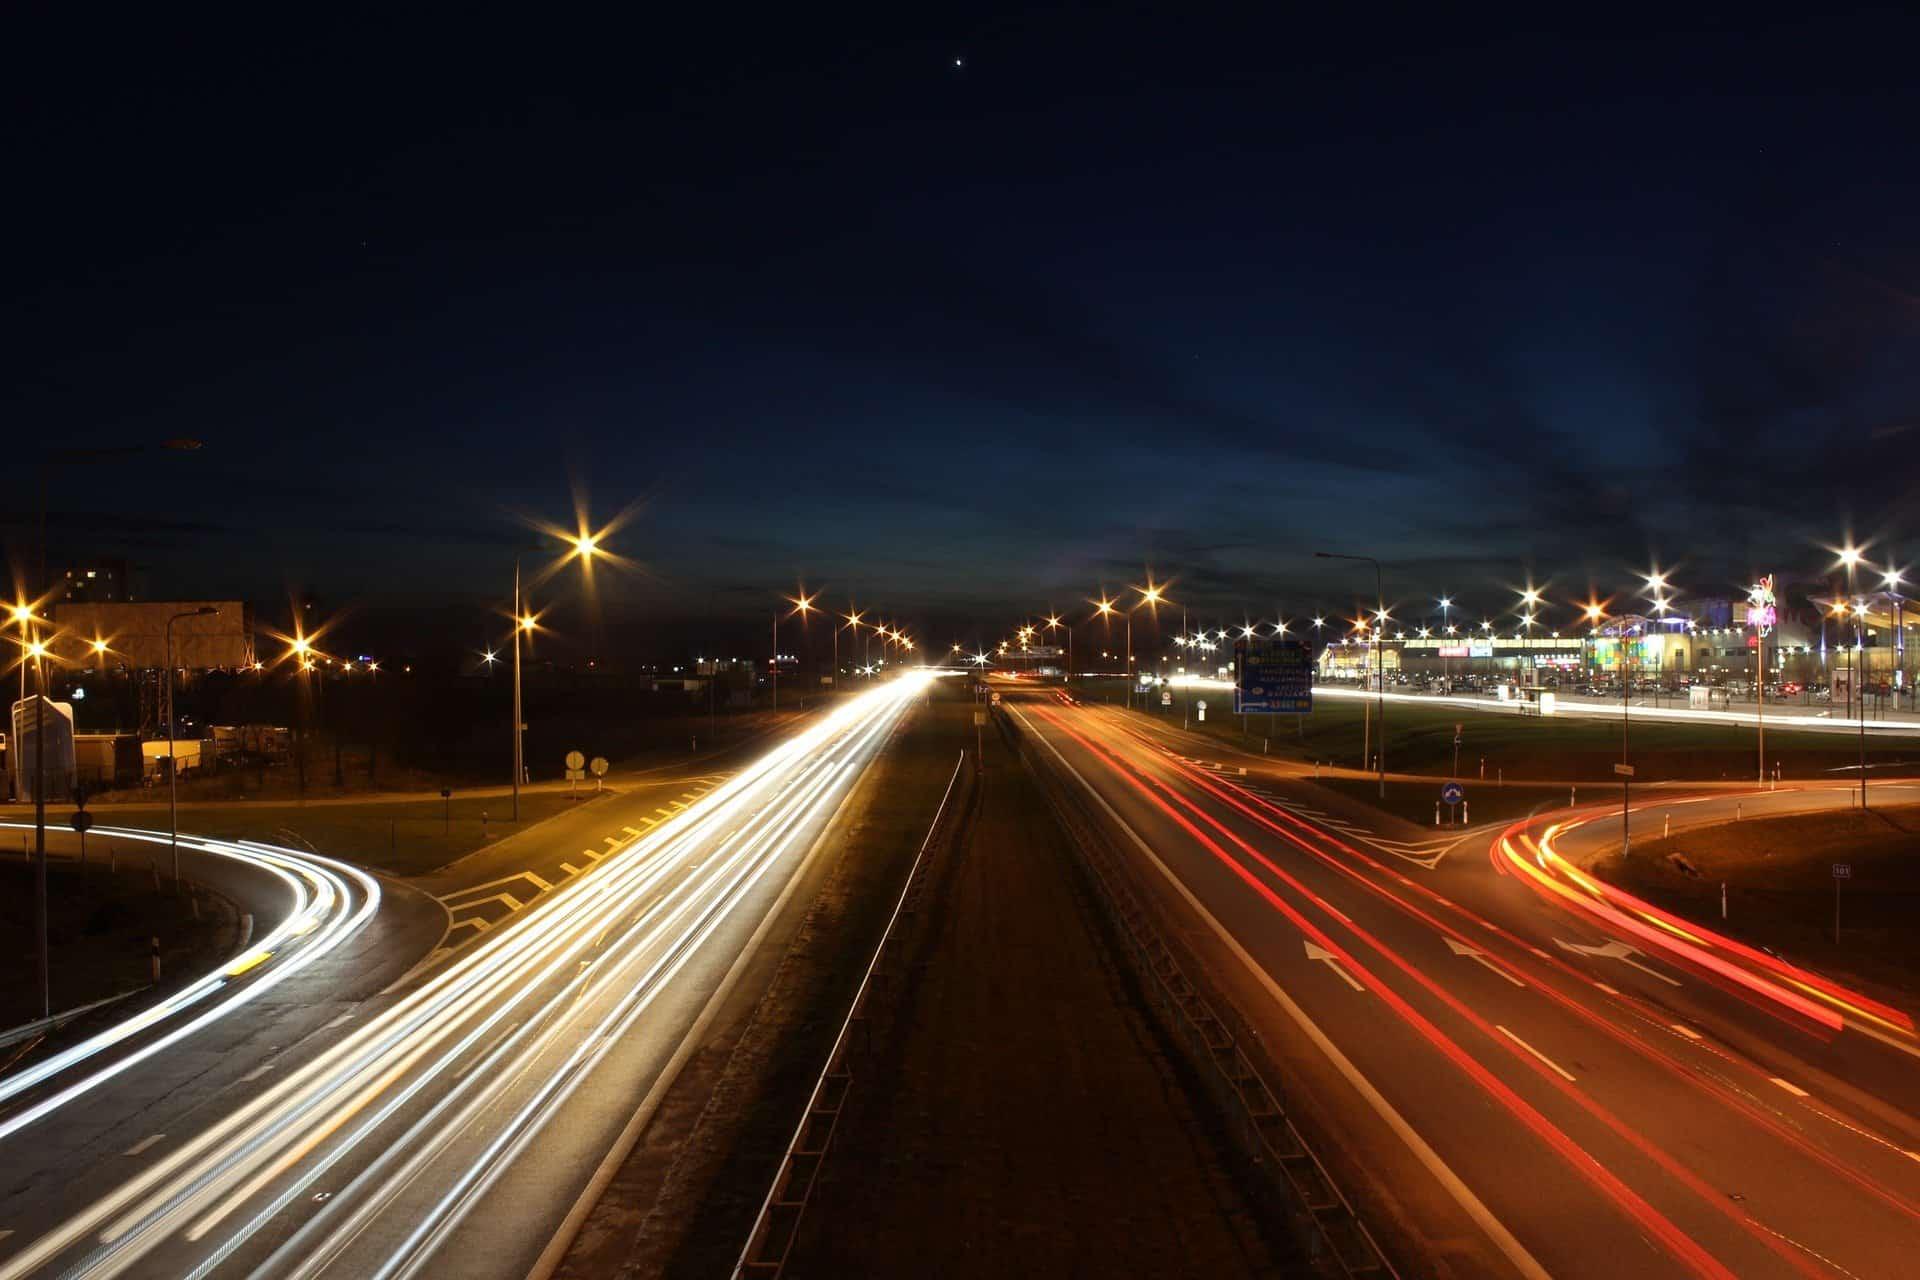 highway night drive pixabay